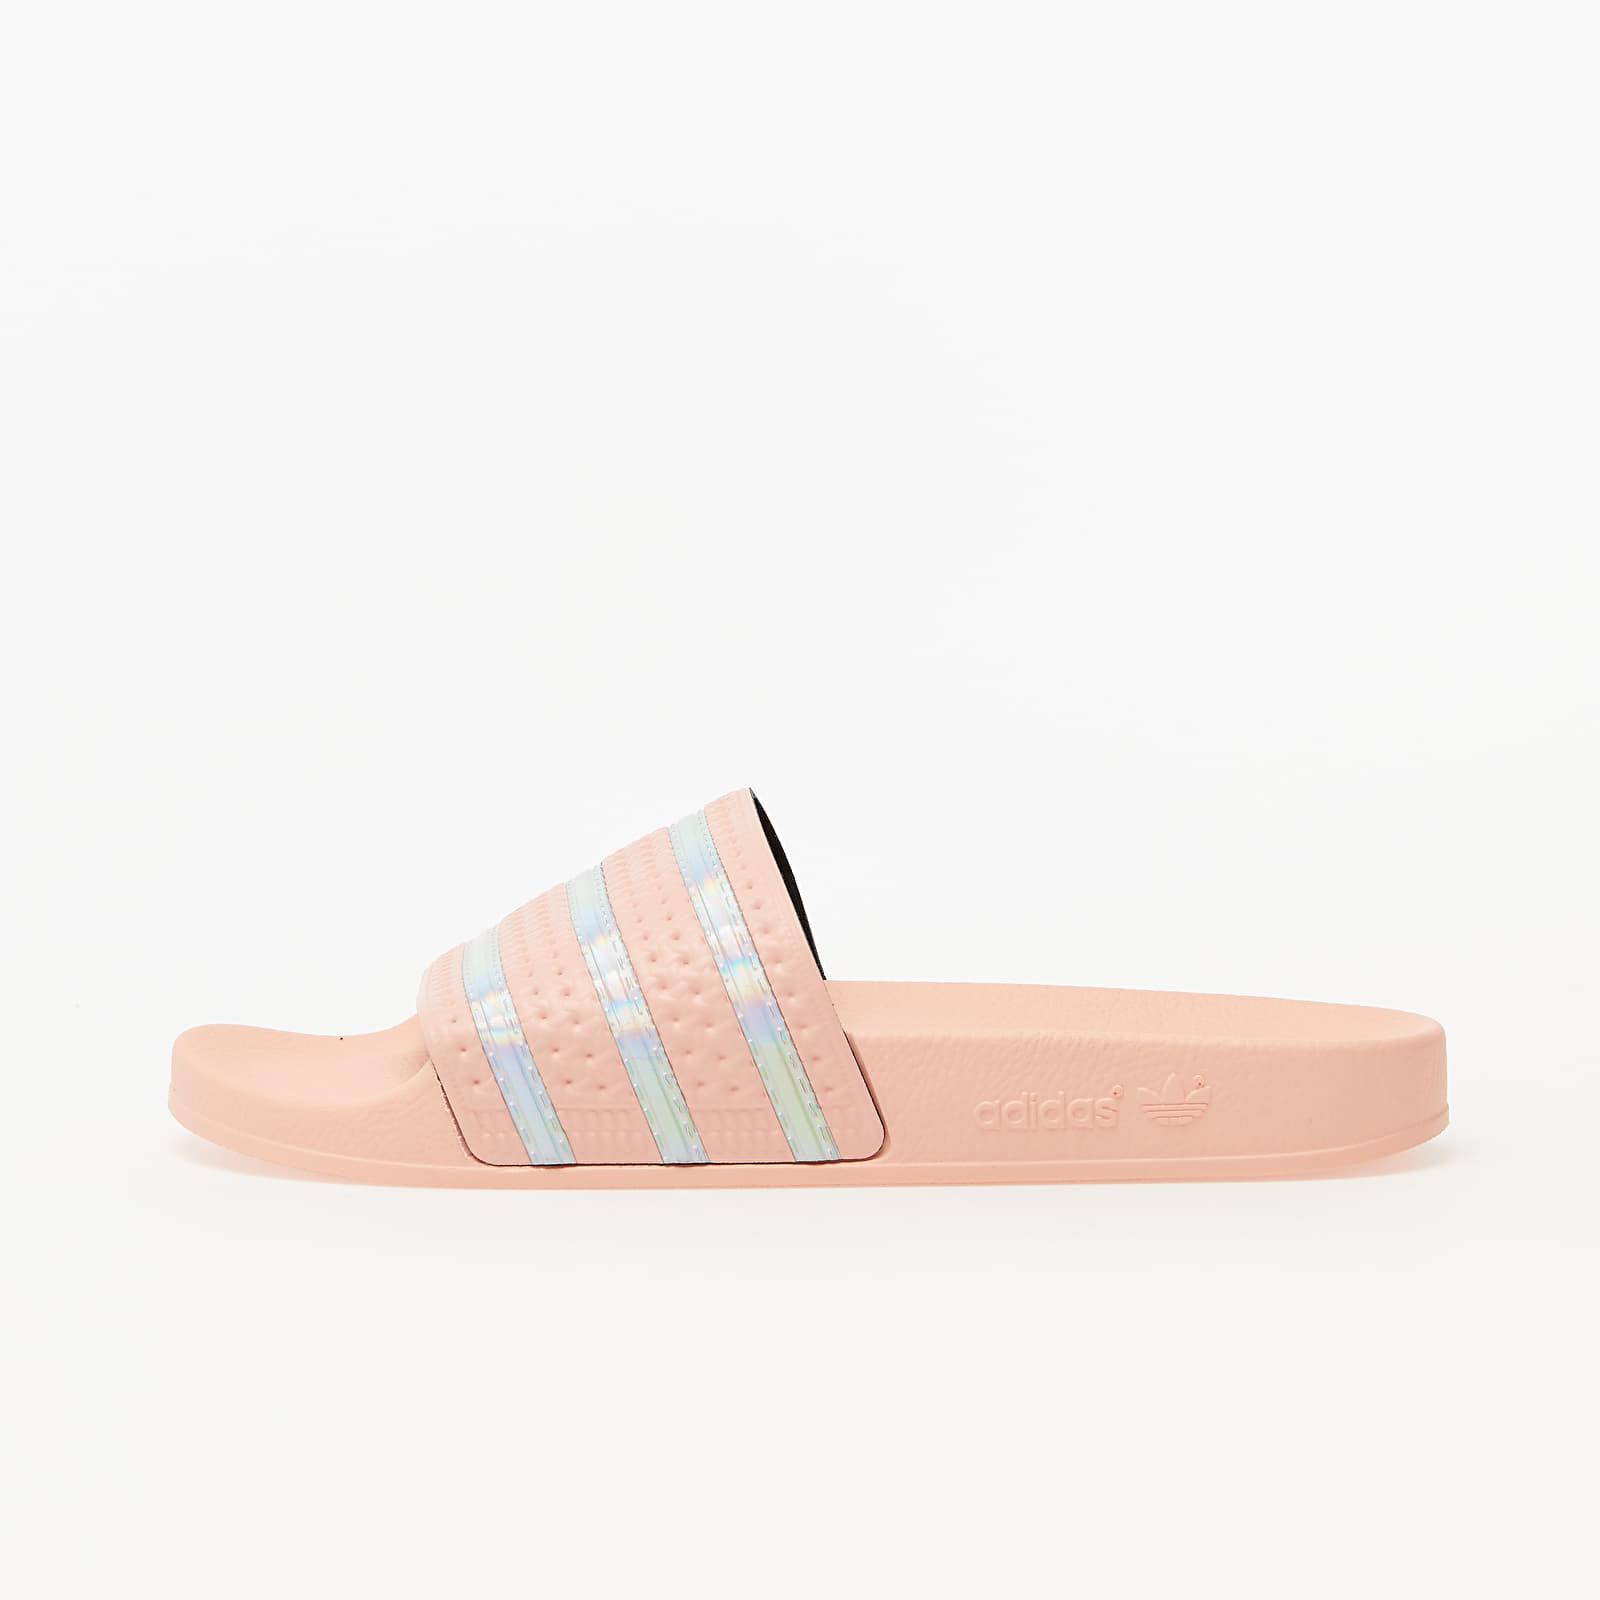 adidas Adilette W Haze Coral/ Ftw White/ Haze Coral EUR 39